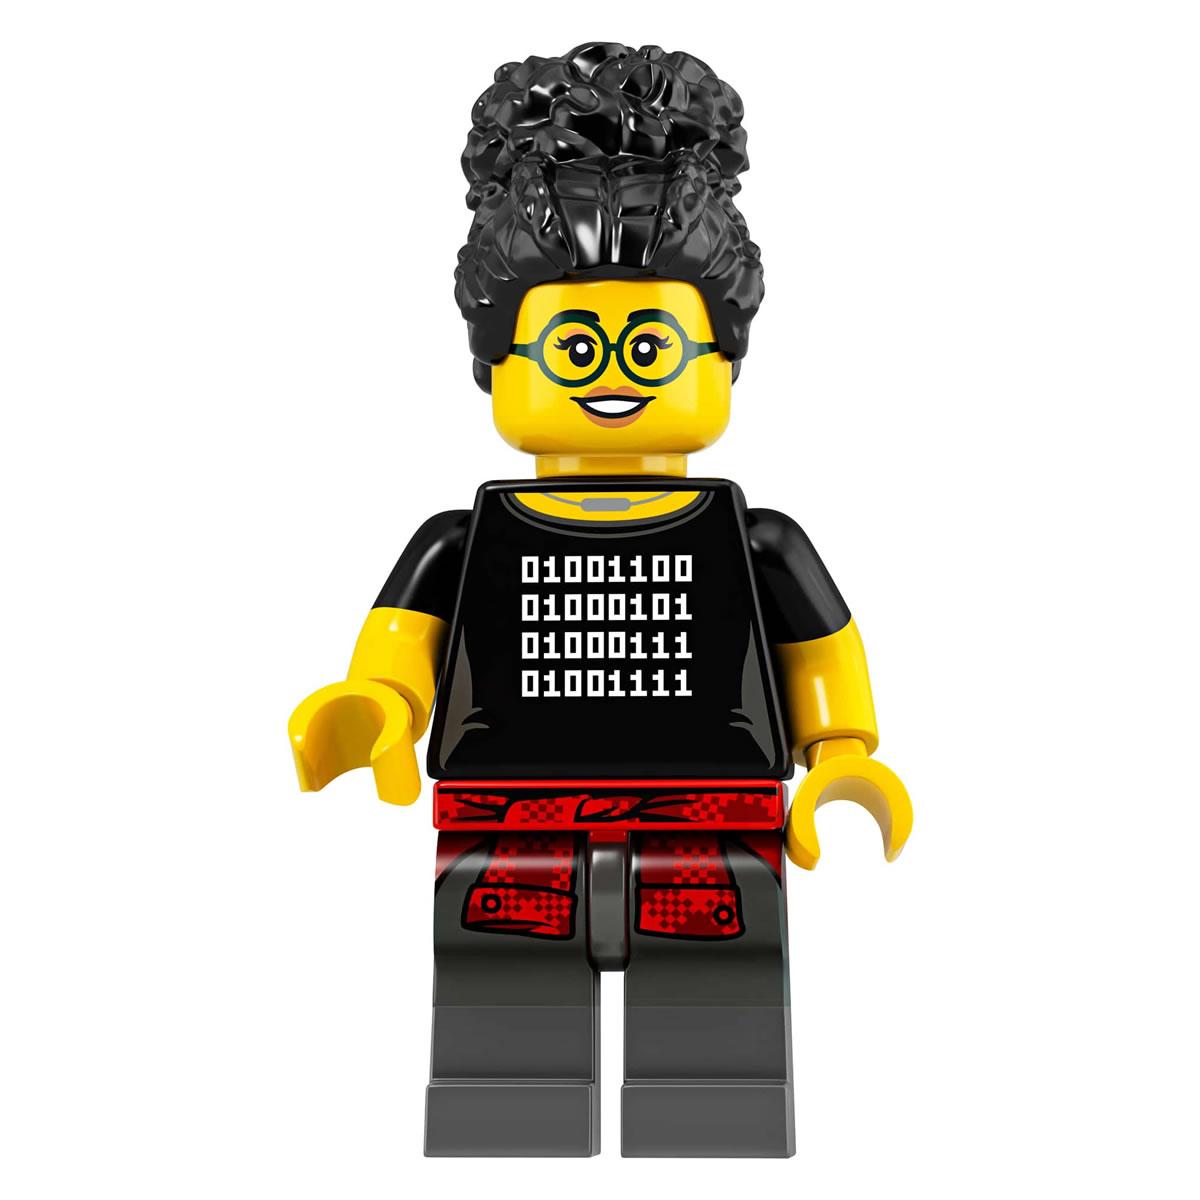 lego-minifiguren-sammelserie-collectible-minifigures-serie-19-71025-2019-6 zusammengebaut.com